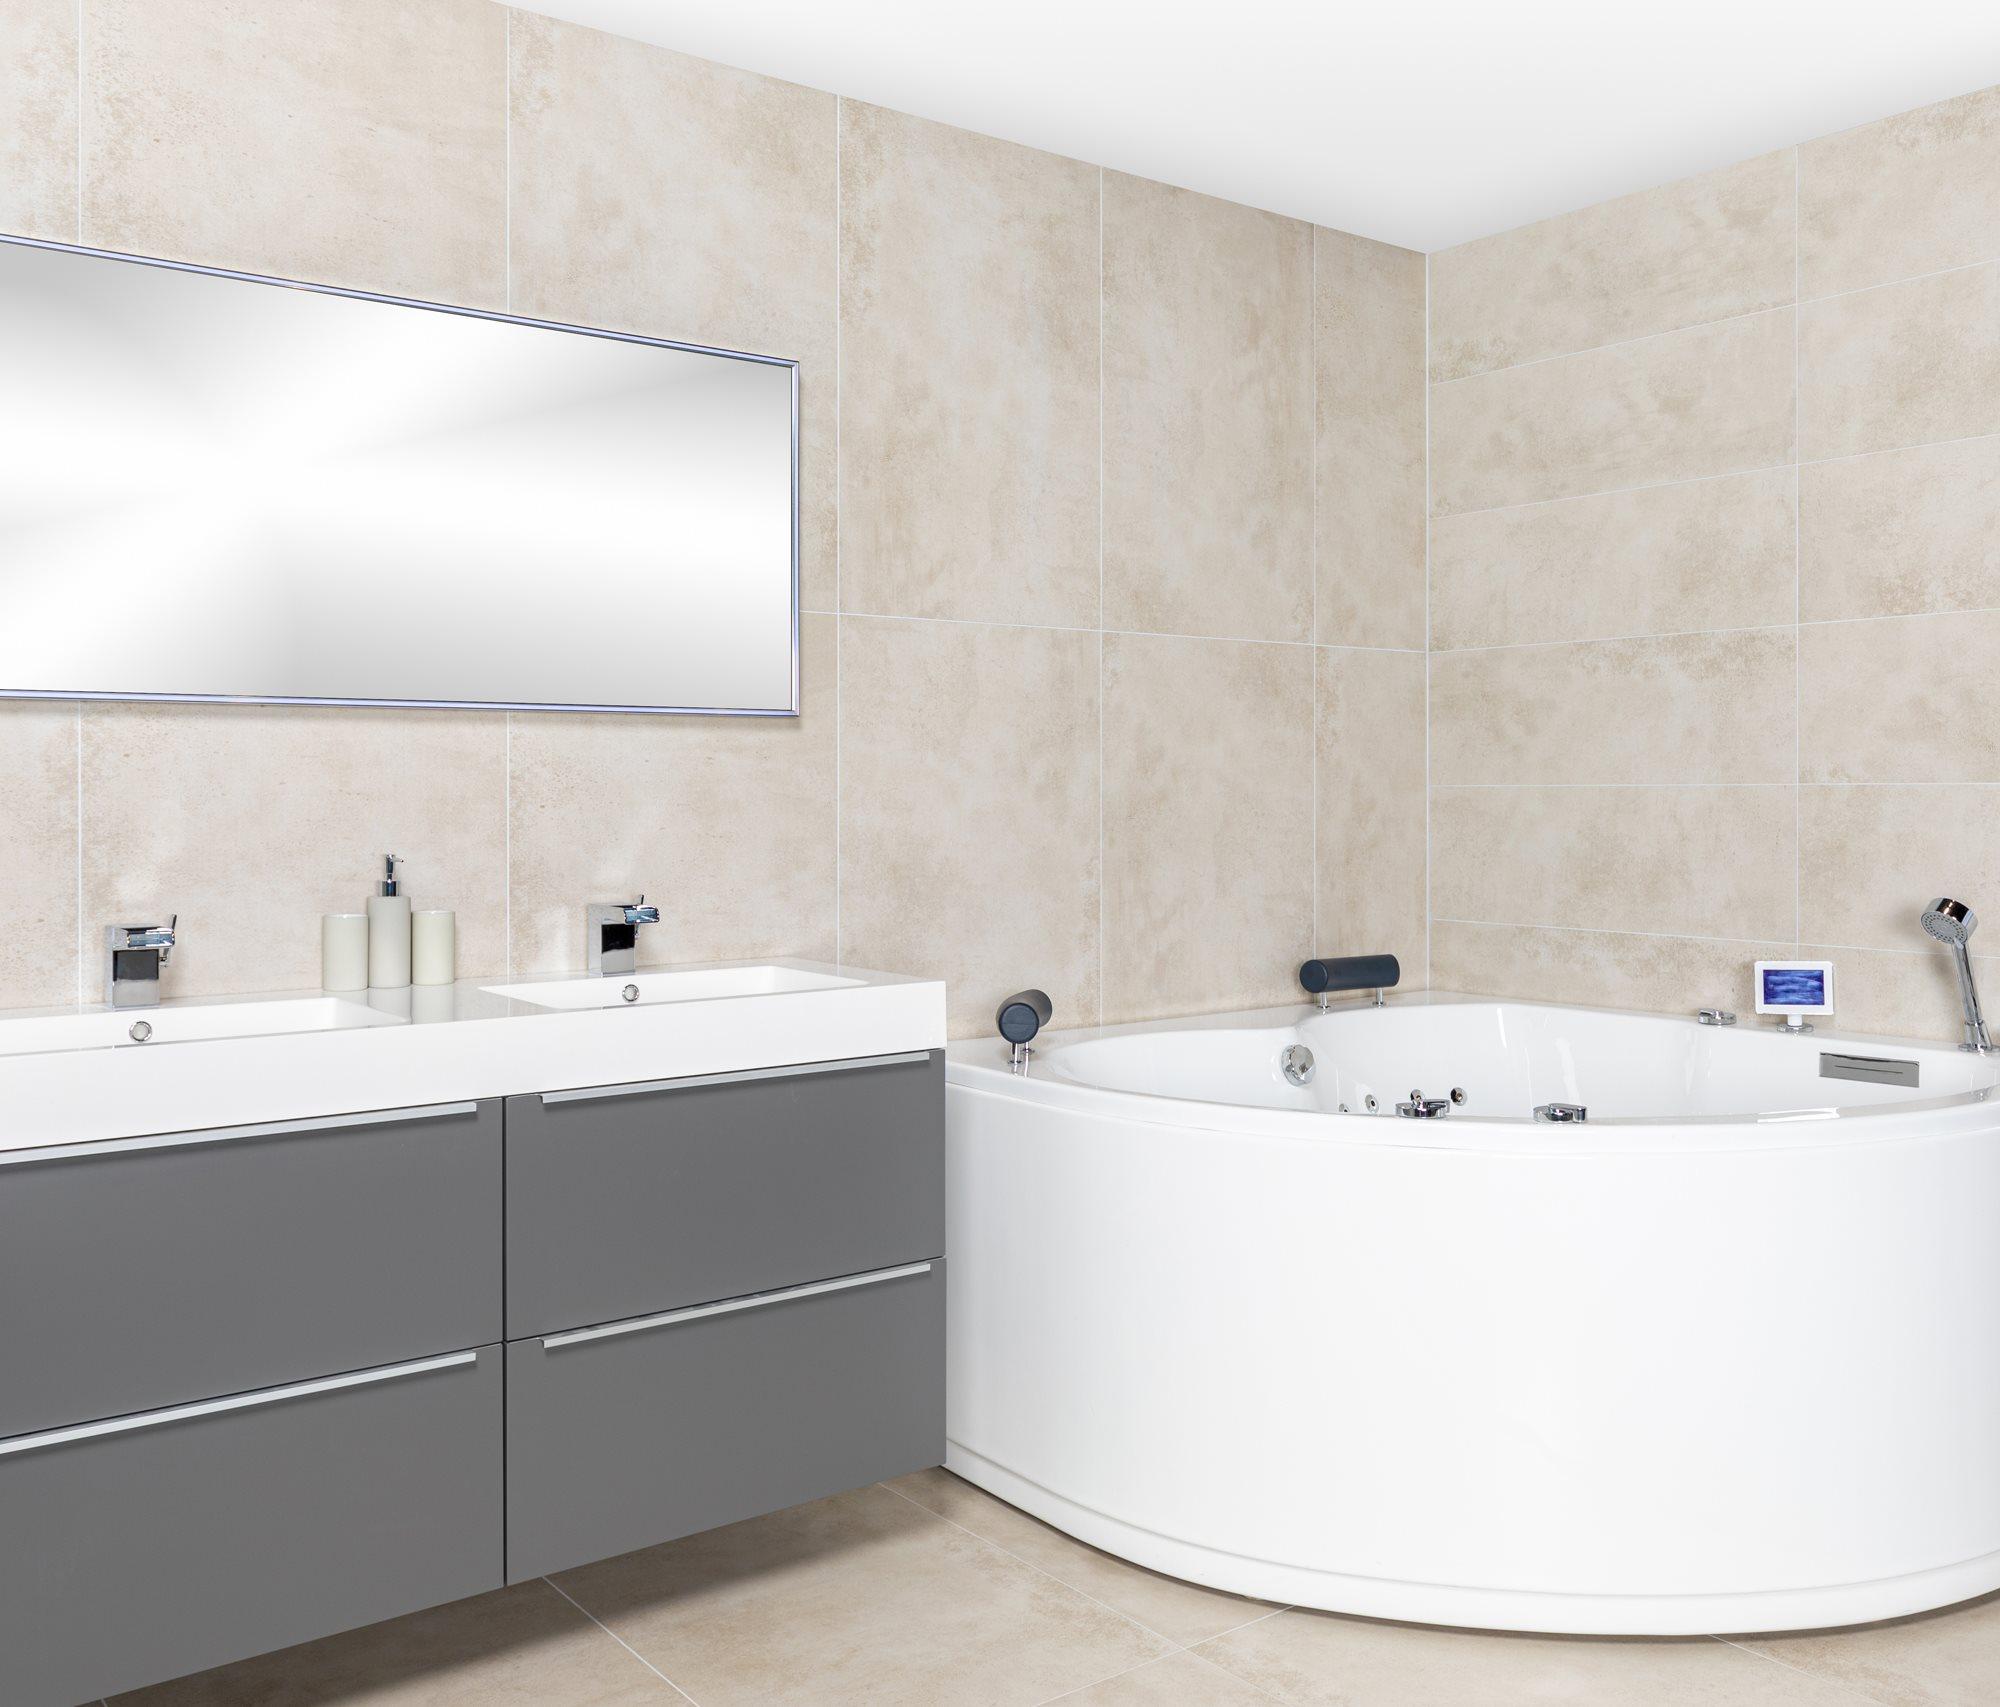 luxe-badkamer-whirlpool-grijs-badkamermeubel.jpg